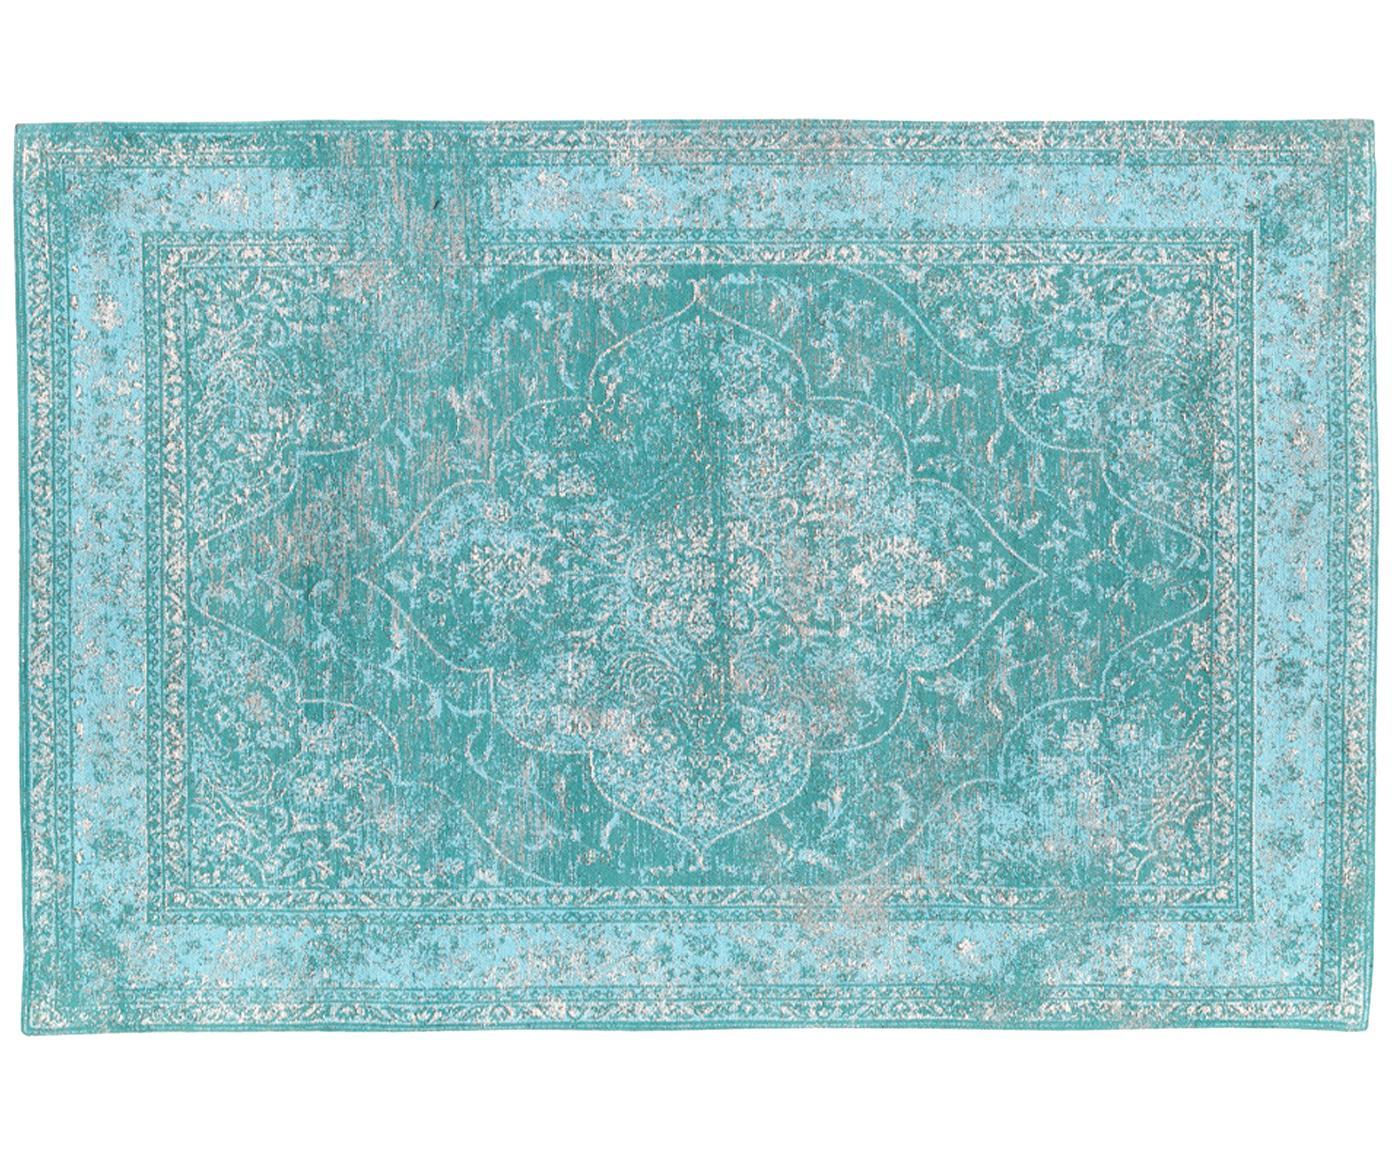 Handgeweven chenille vloerkleed Palermo, Bovenzijde: 95% katoen, 5% polyester, Onderzijde: 100% katoen, Turquoise, lichtblauw, crèmekleurig, 120 x 180 cm